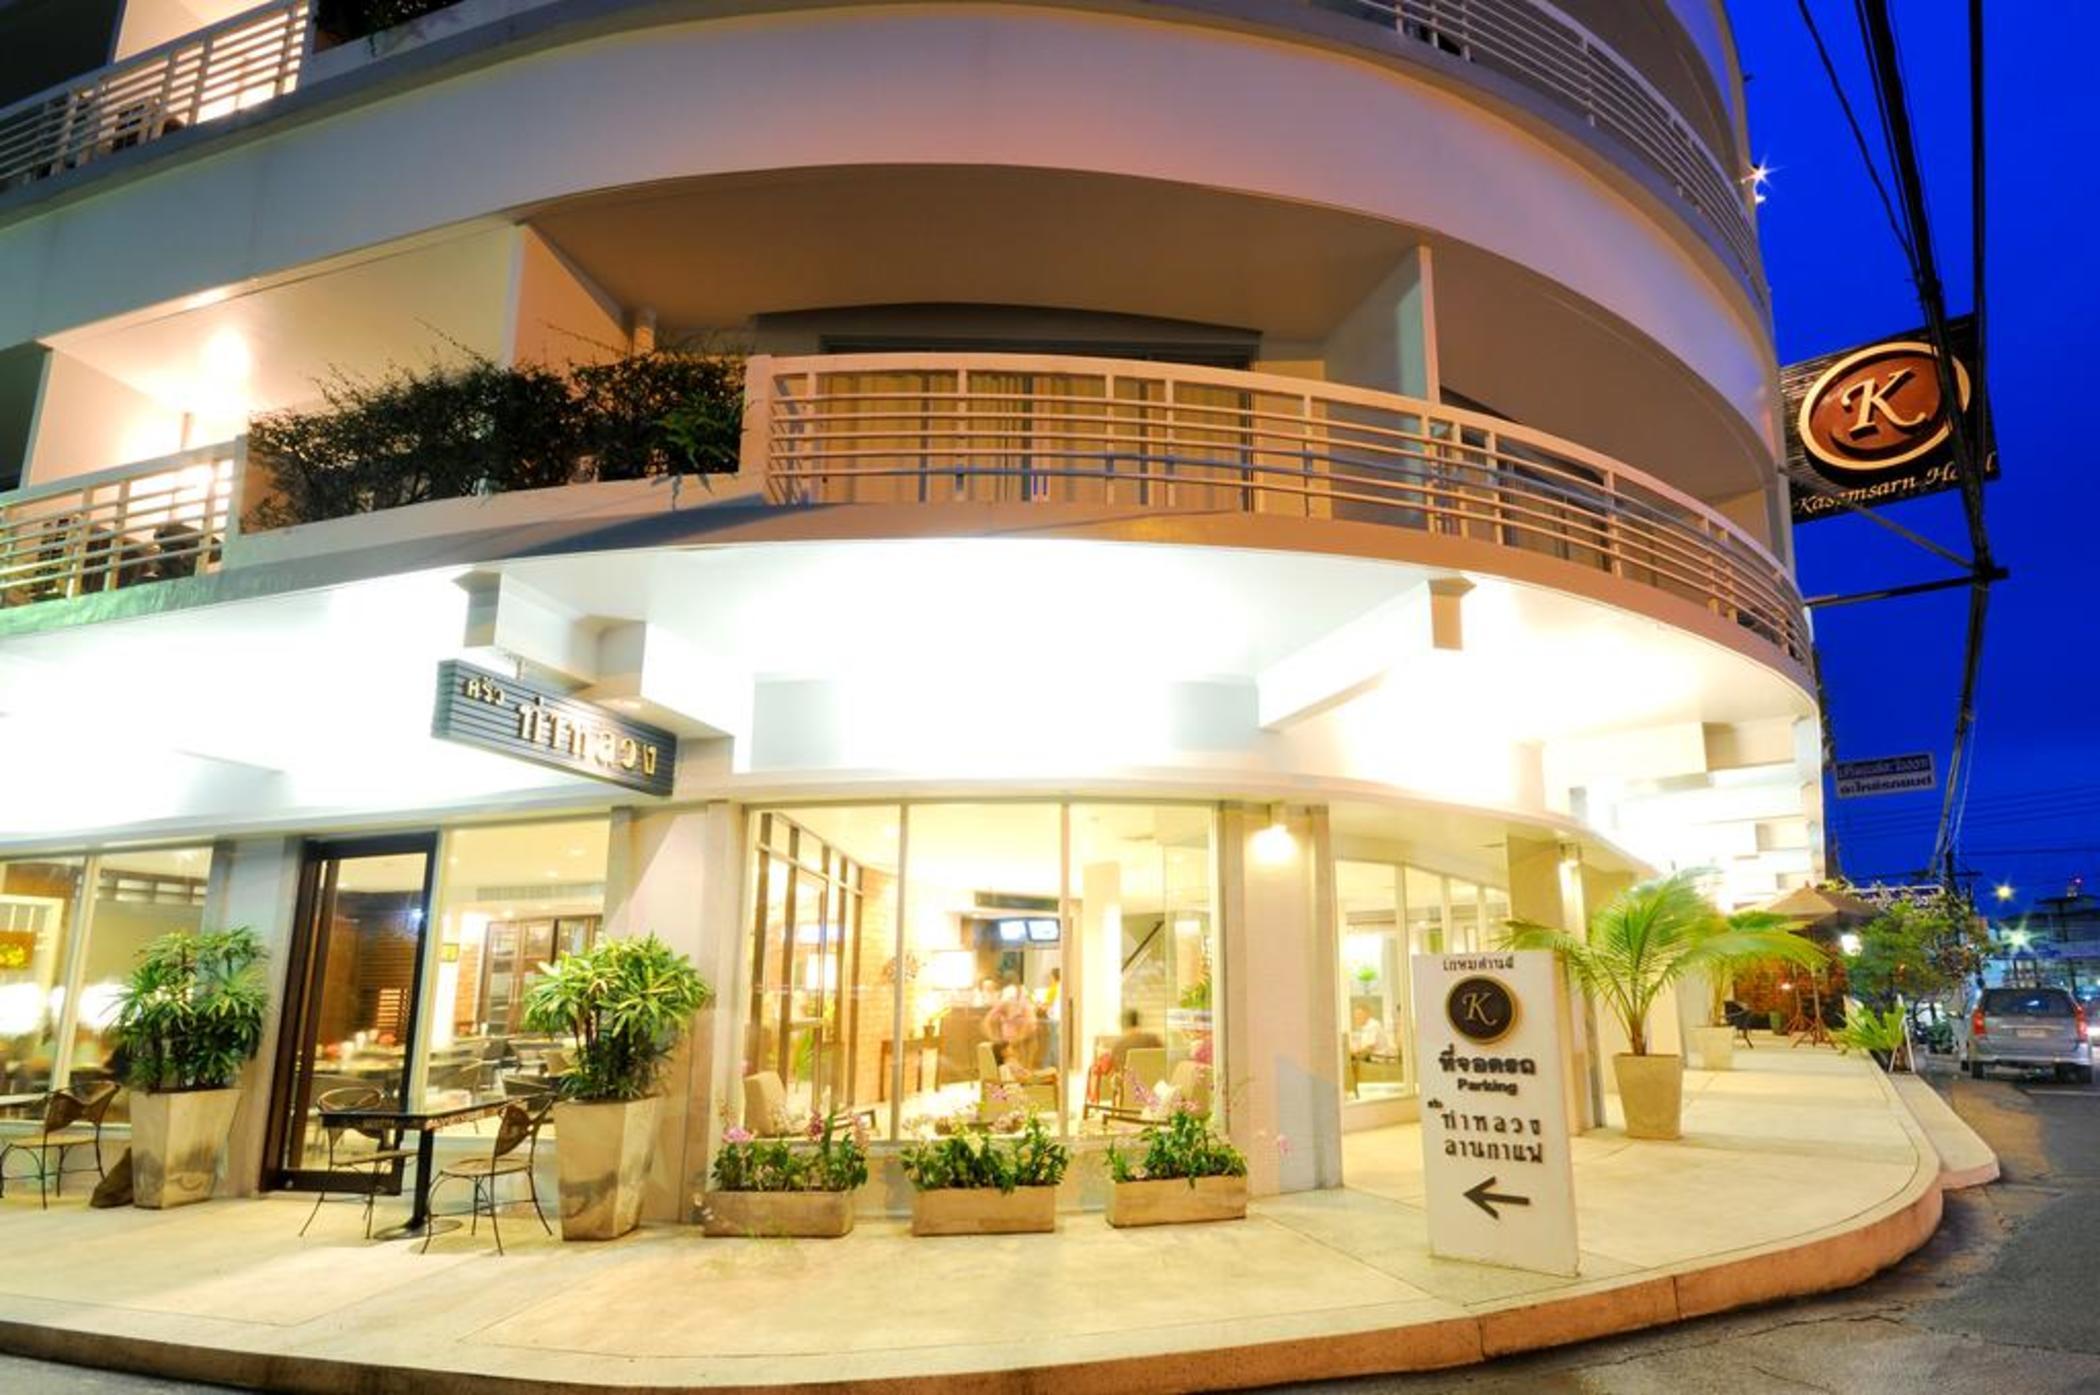 Kasemsarn Hotel Chanthaburi, Muang Chanthaburi